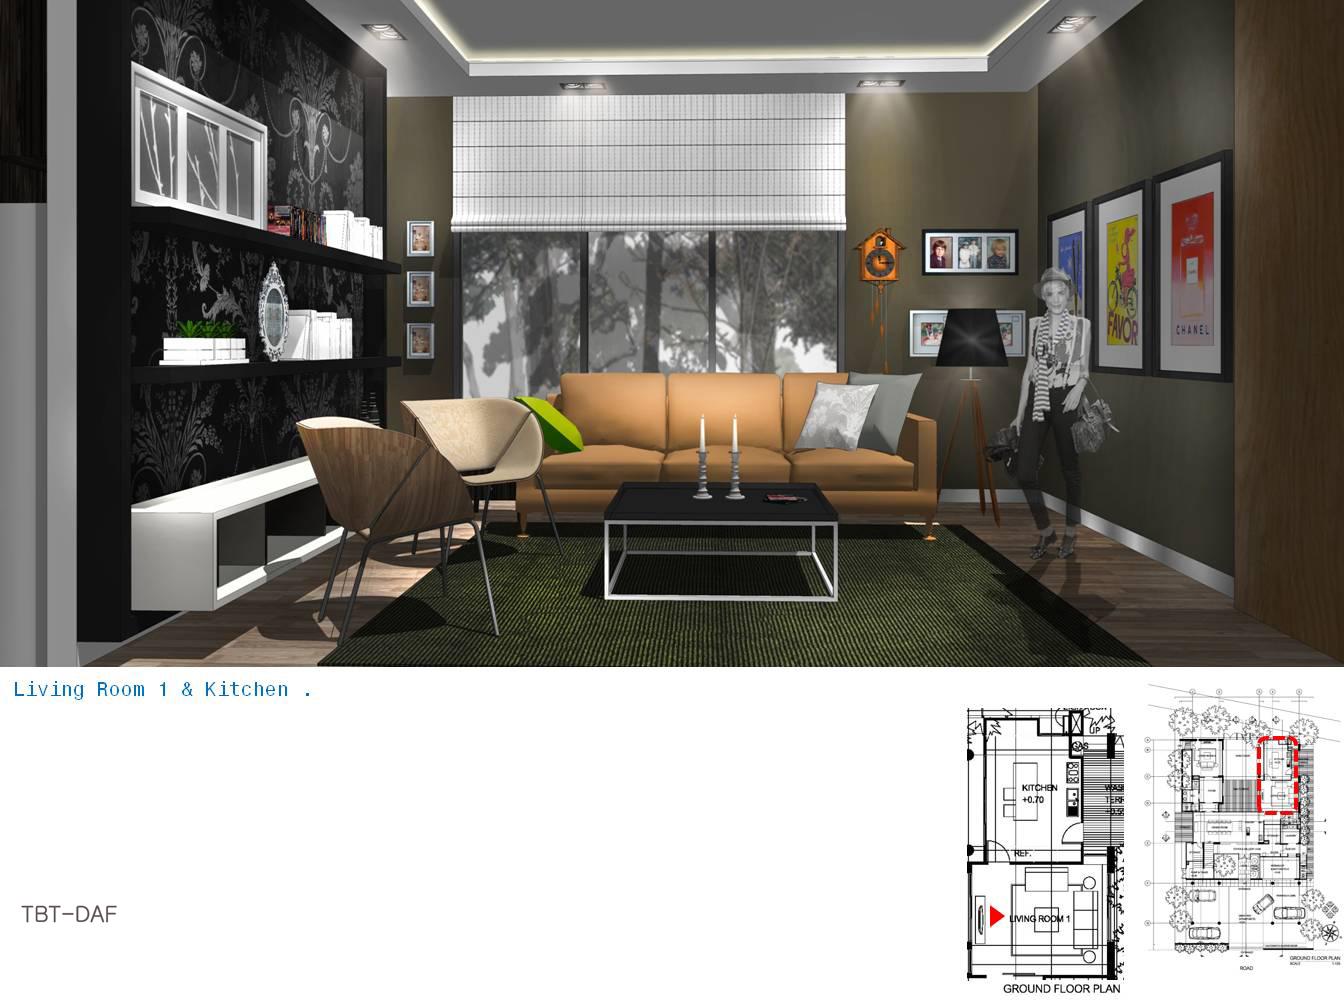 TBT-DAF interior design house robinson 7